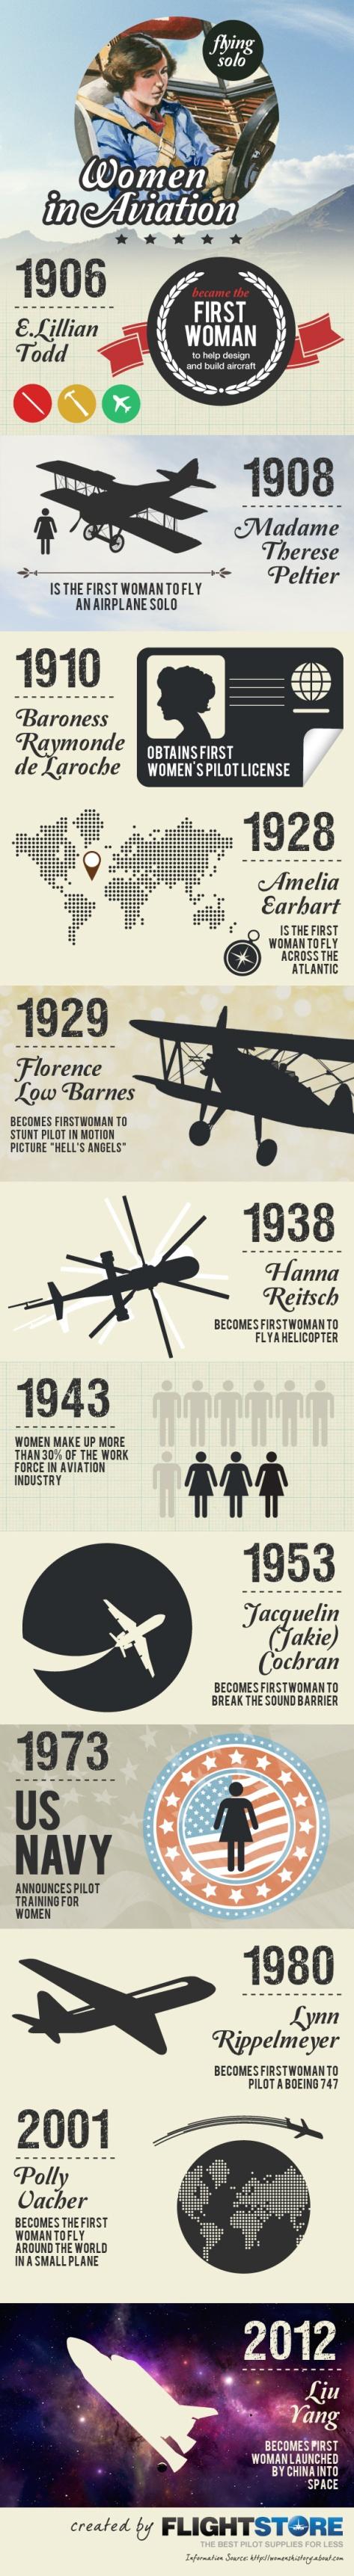 Woman In Aviation